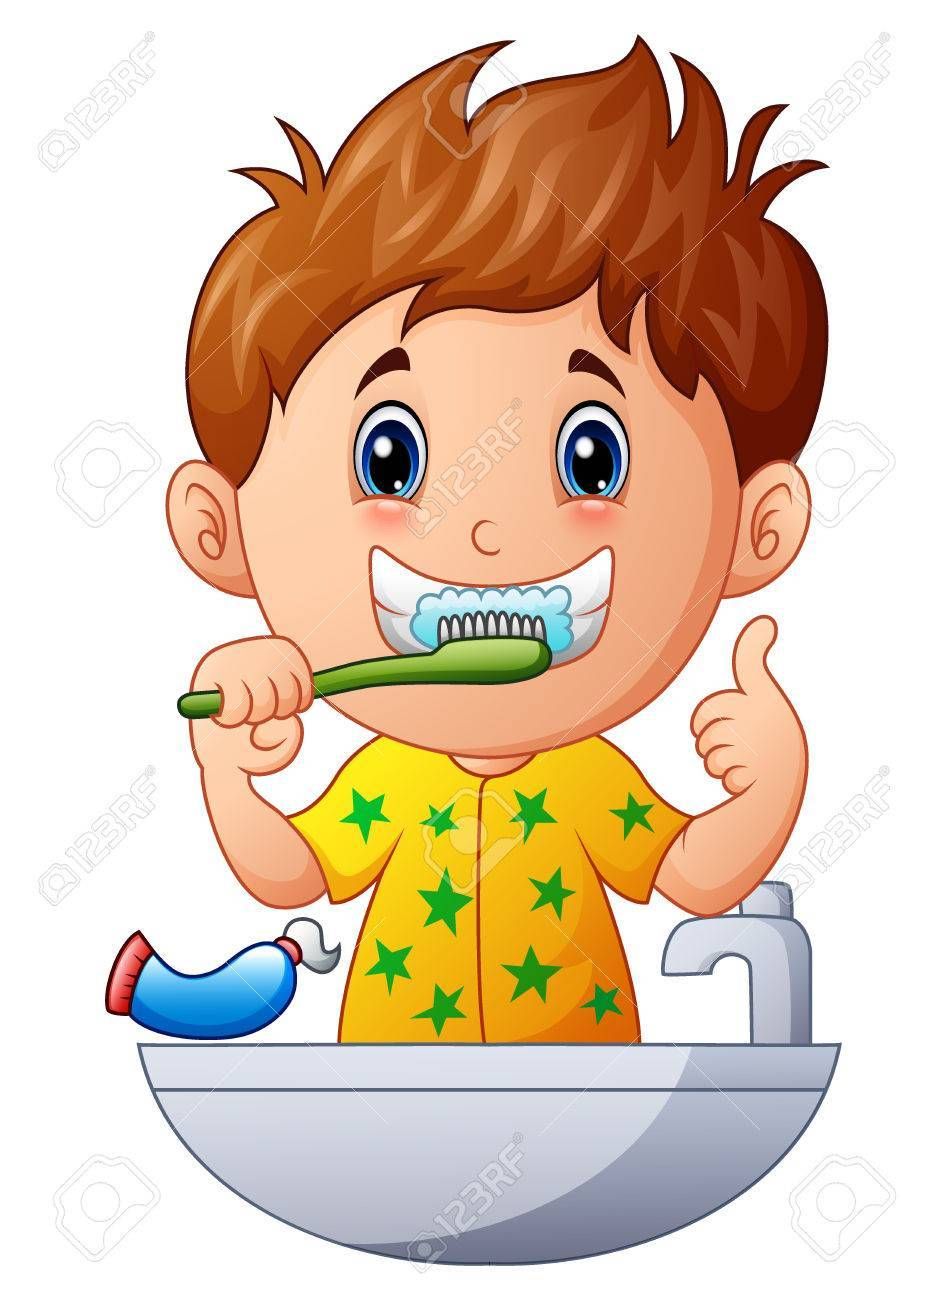 Brushing teeth clipart 2 » Clipart Portal.